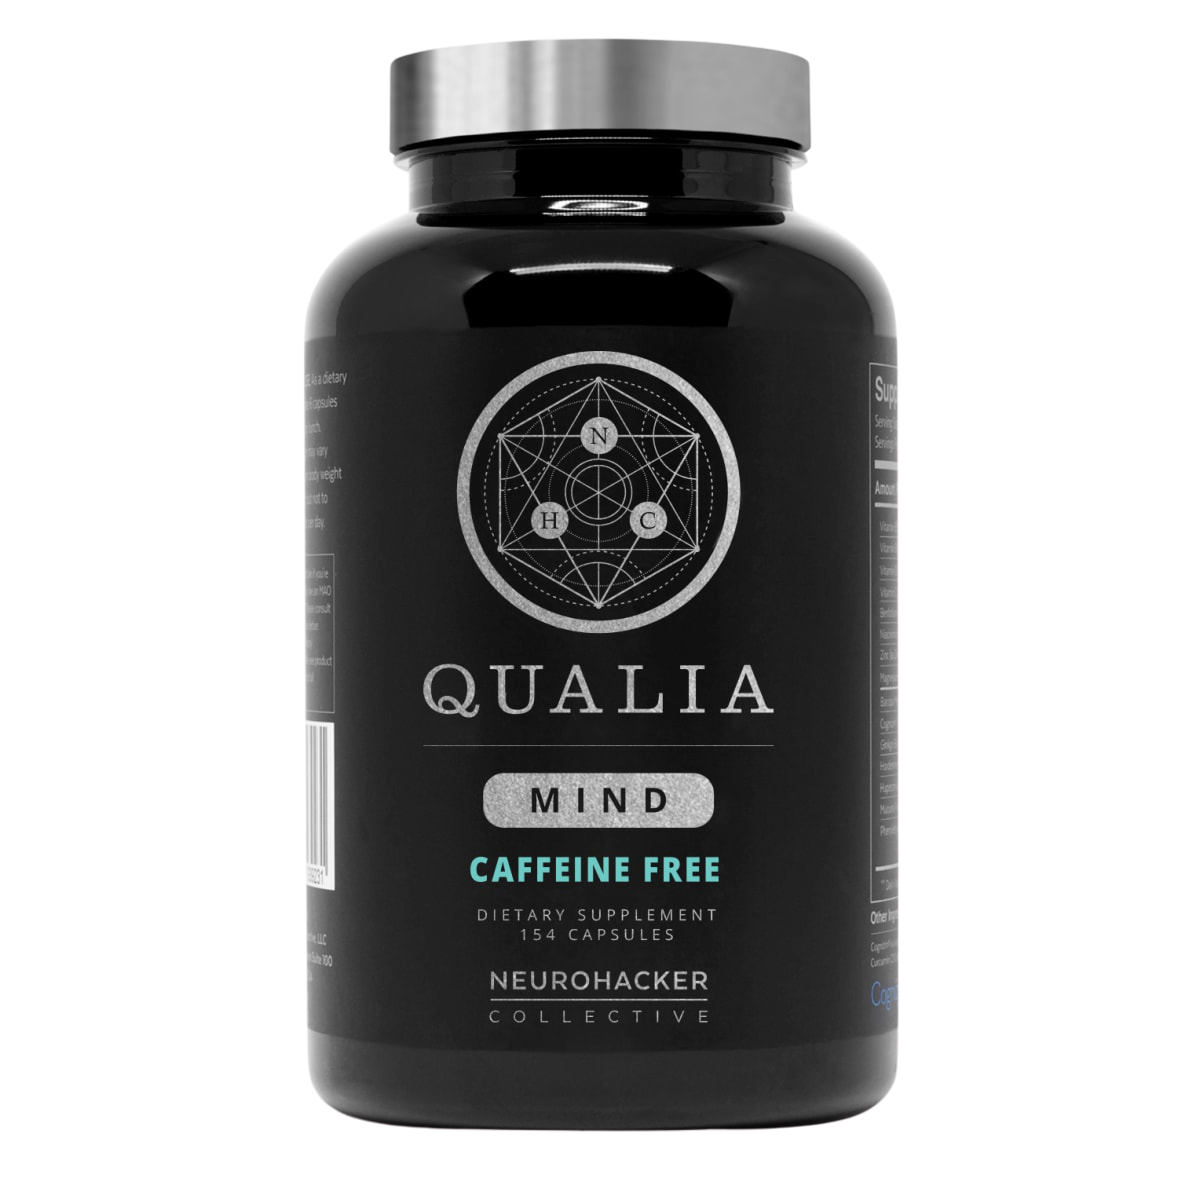 Qualia Mind Caffeine Free,NEUROHACKER COLLECTIVE , 154 vegcaps